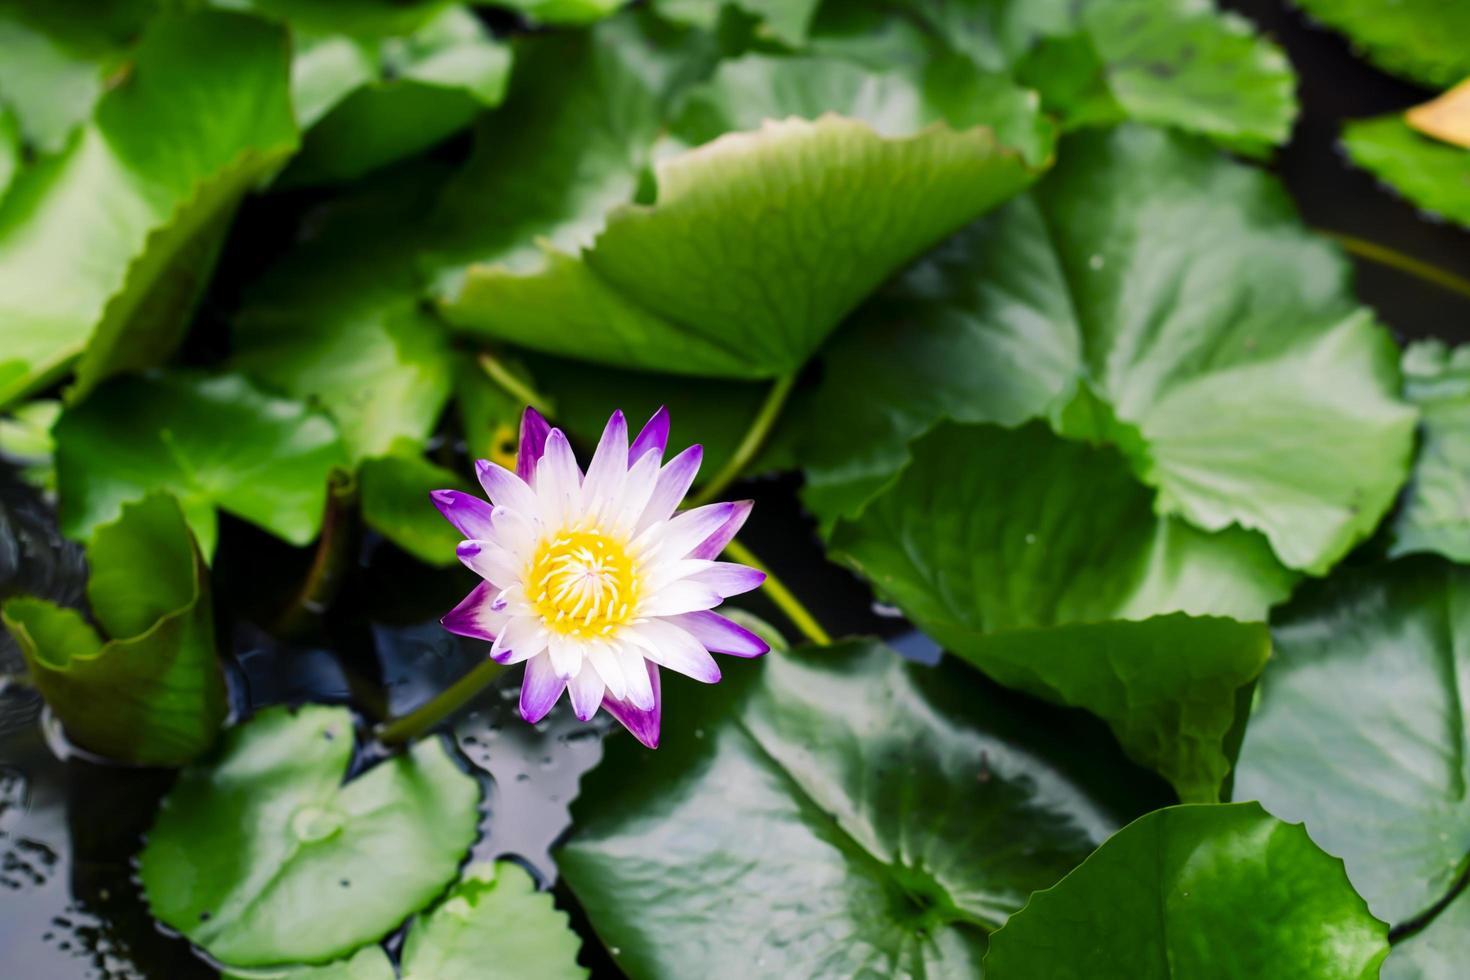 beau nénuphar violet photo